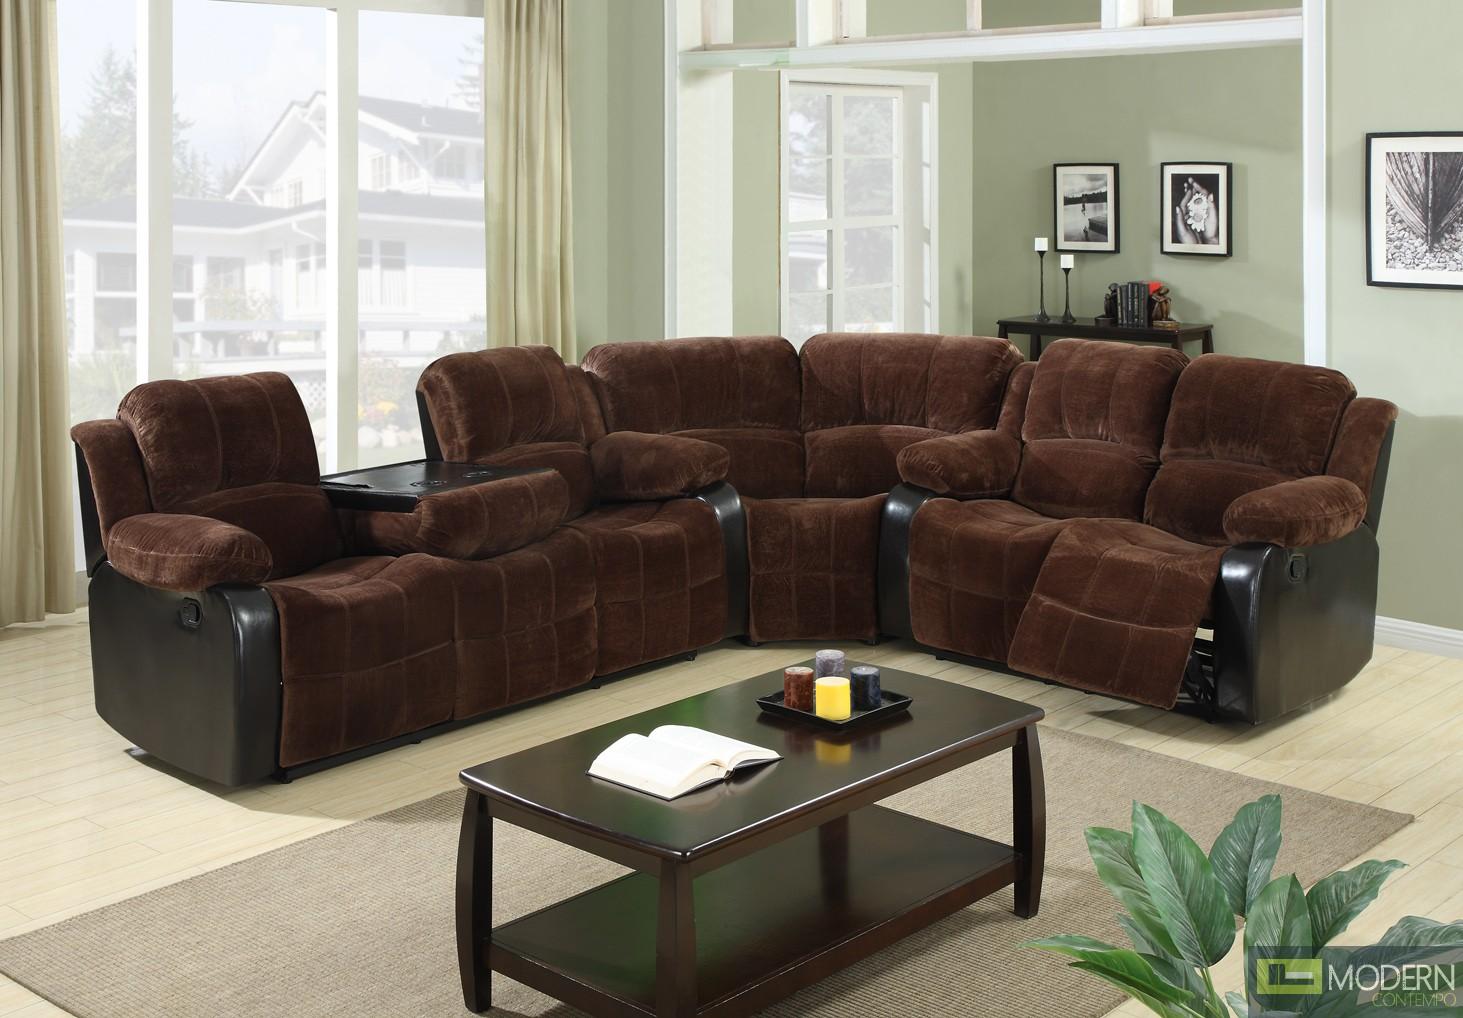 3 Pc Modern Chocolate Sectional Sofa Set Living Room Set TBQS489